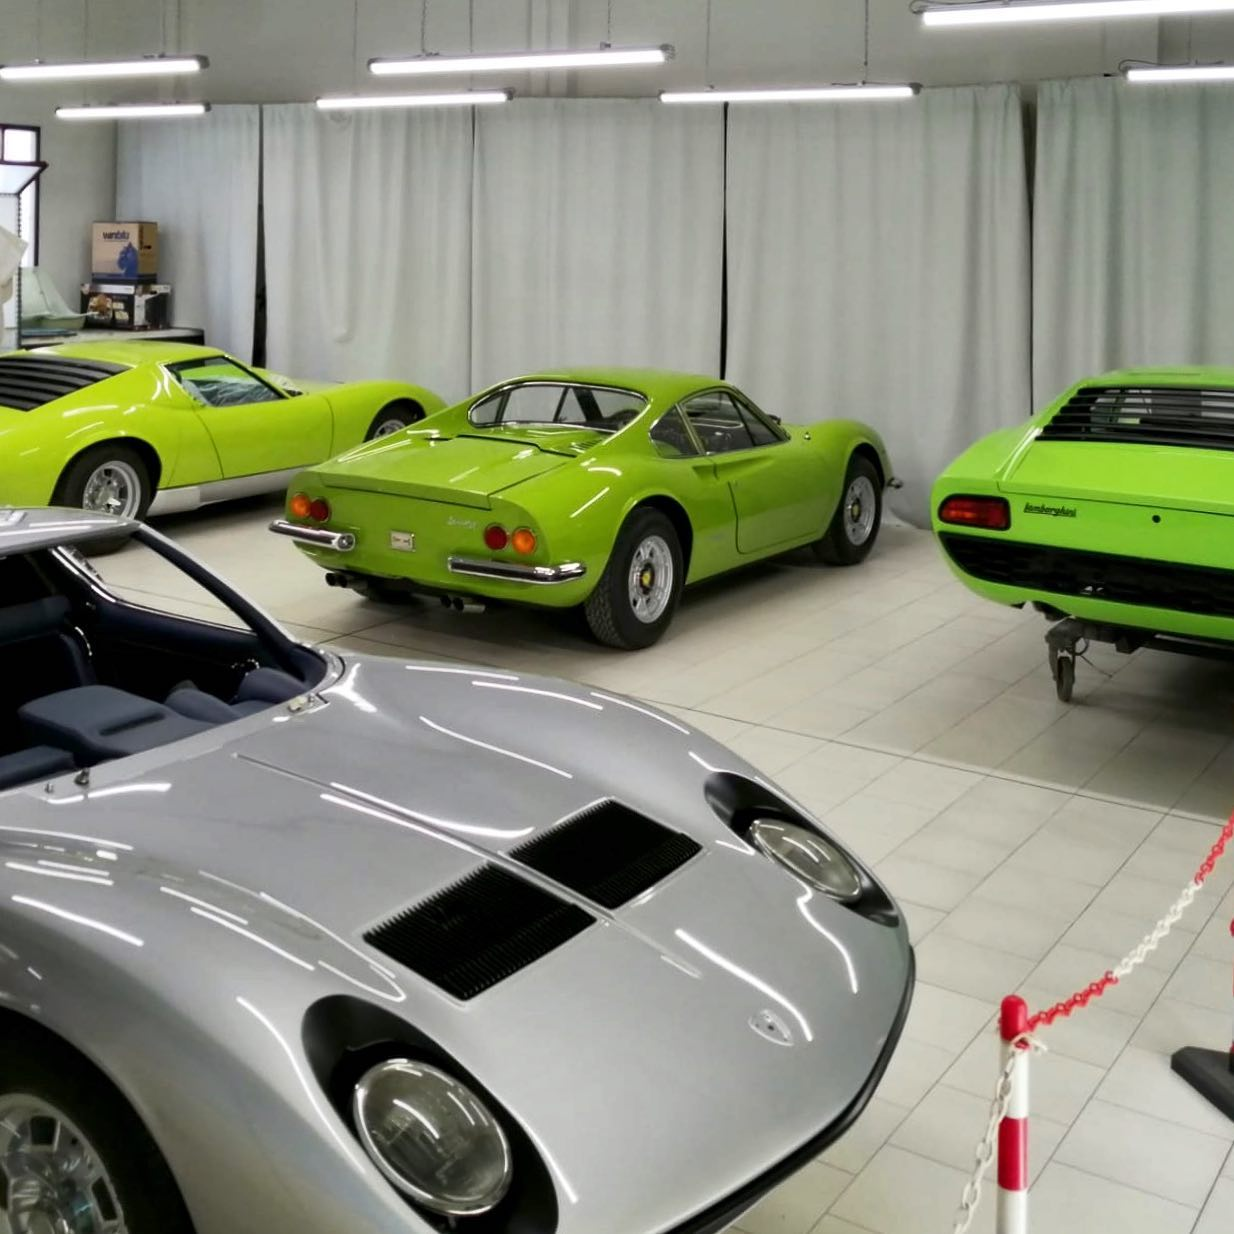 Odd one out! – – – #oddoneout #miura #lamborghini #ferrari #dino246gt #supercars #italianstyle #doosetdaram #madeinmodena #classiccars #summervibes #WaitingforMiuraBook